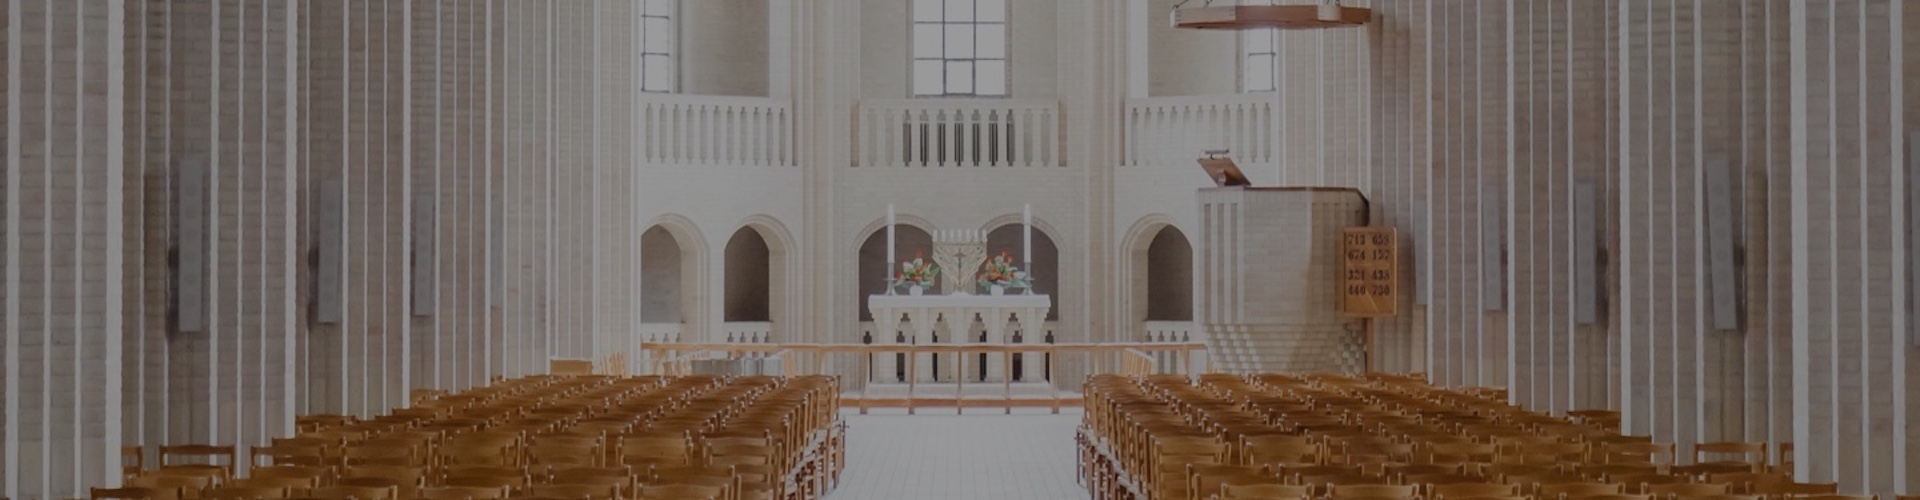 Nrsv Catholic Edition Bible Press New Revised Standard Version Pdf Free Download